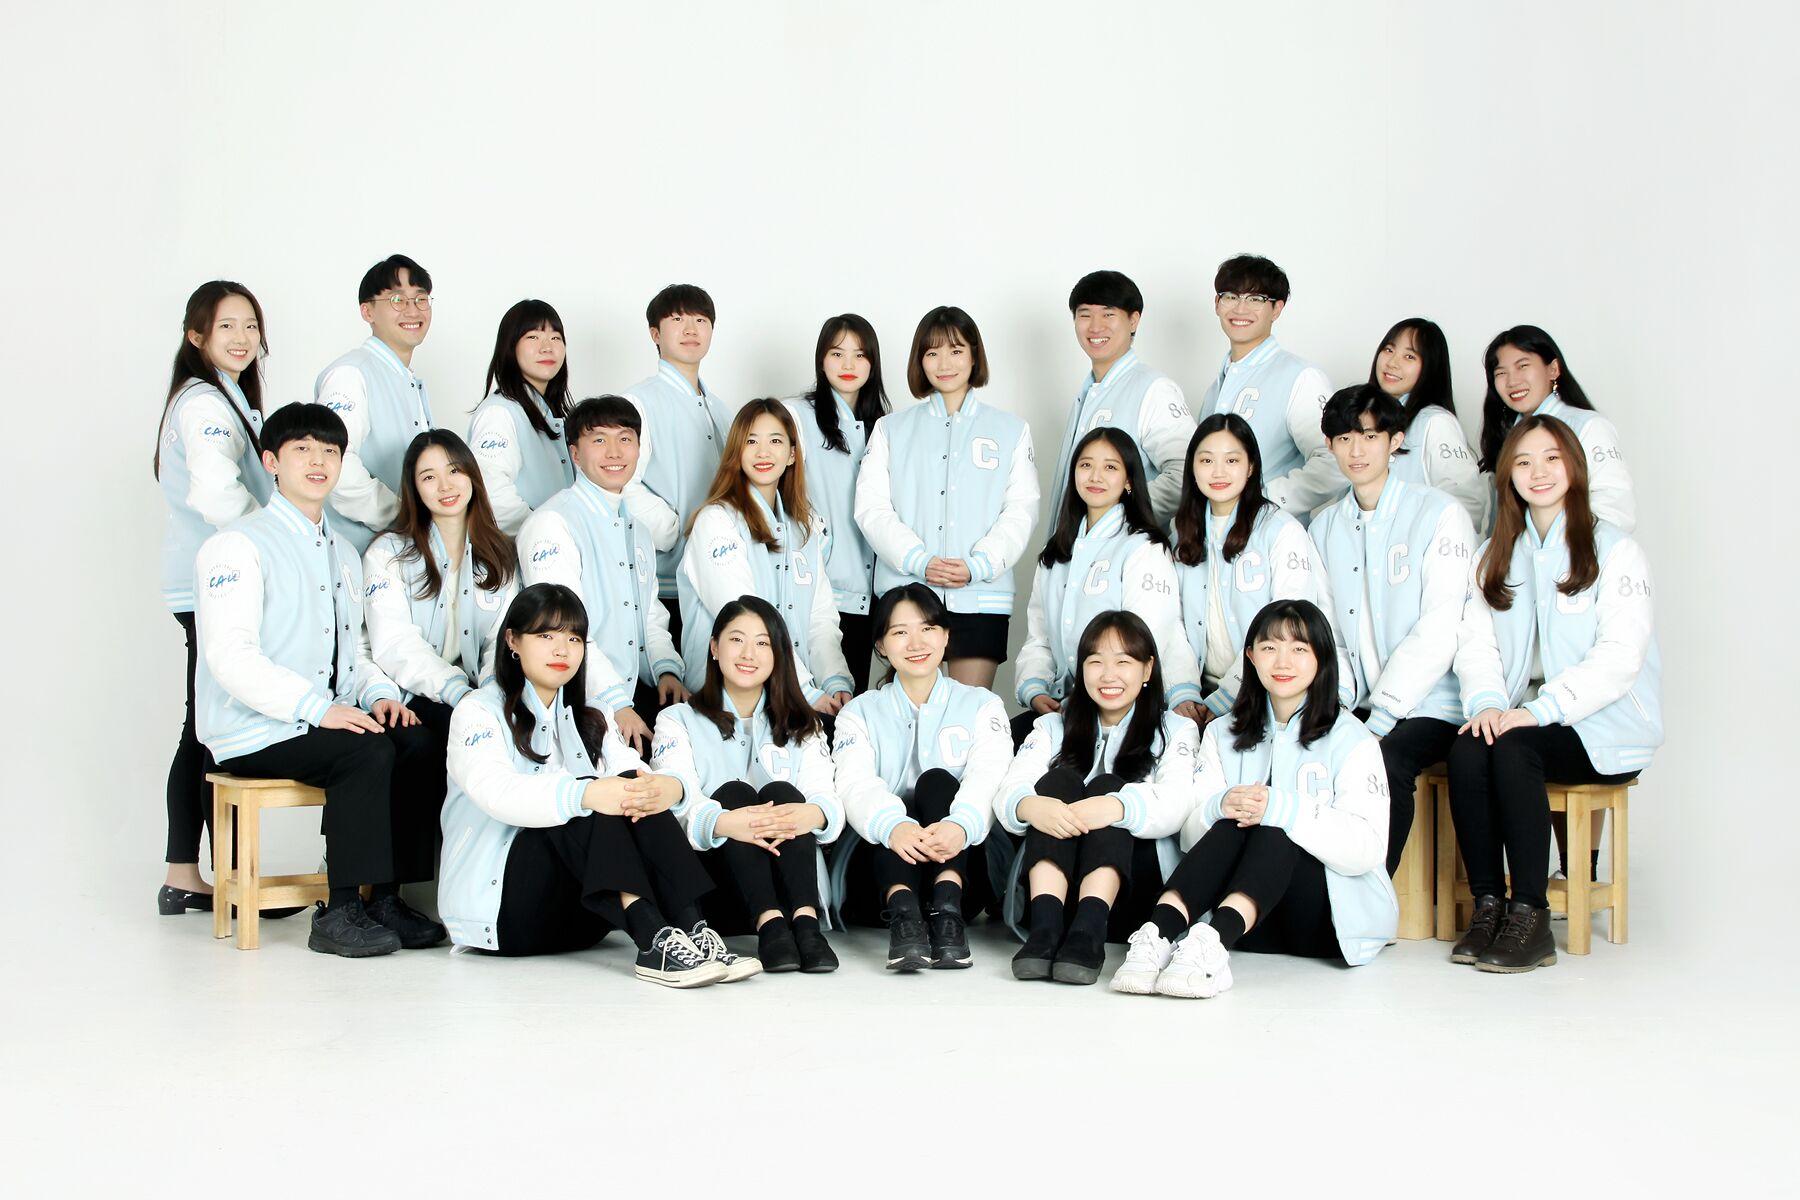 KakaoTalk_Photo_2020-04-03-11-25-35